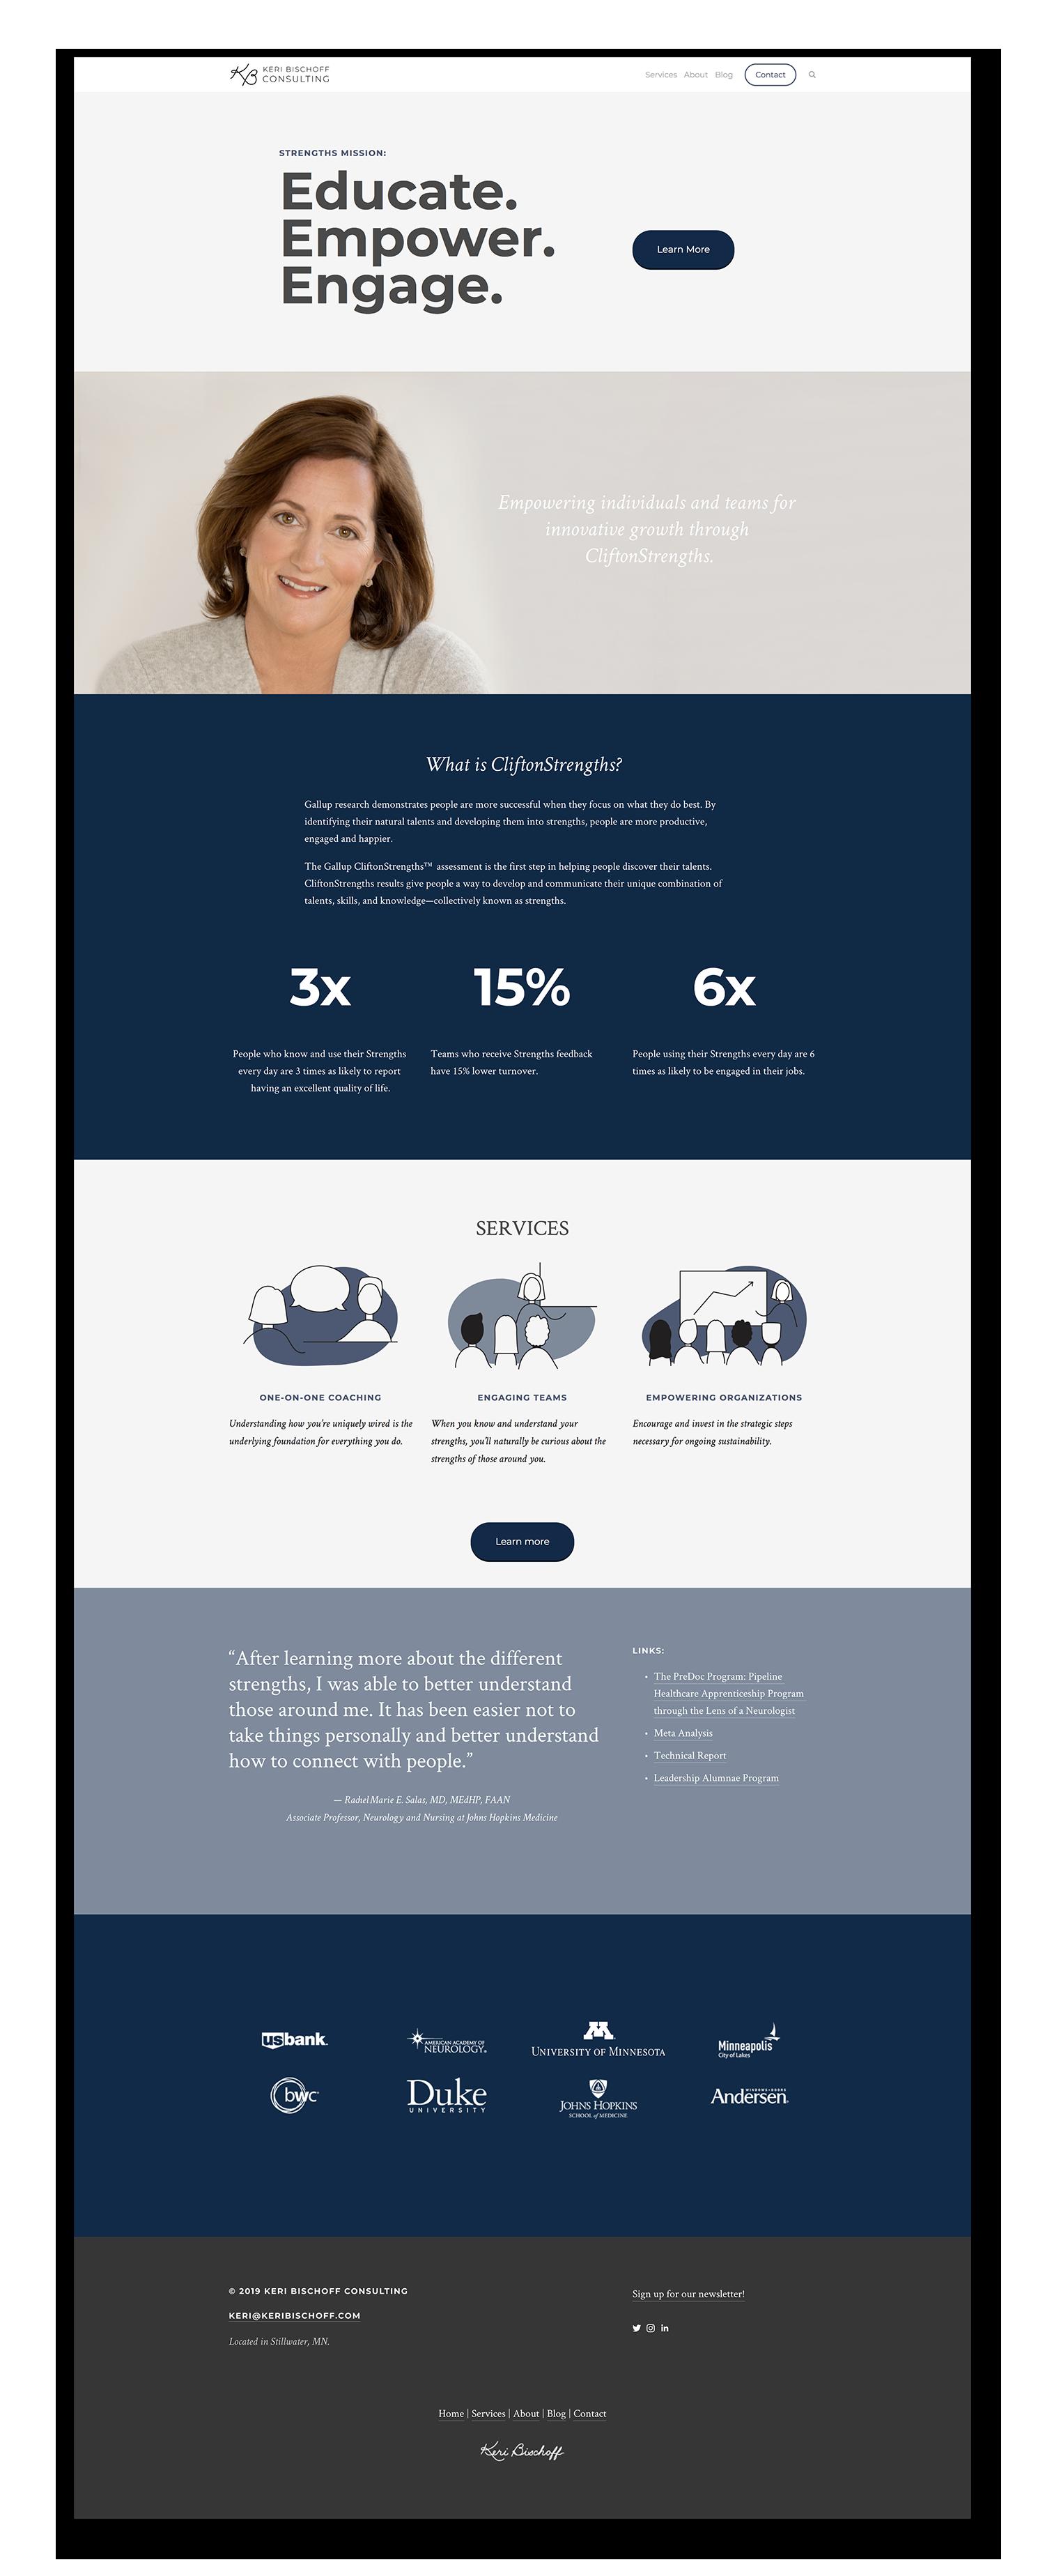 Website designed using Squarespace.